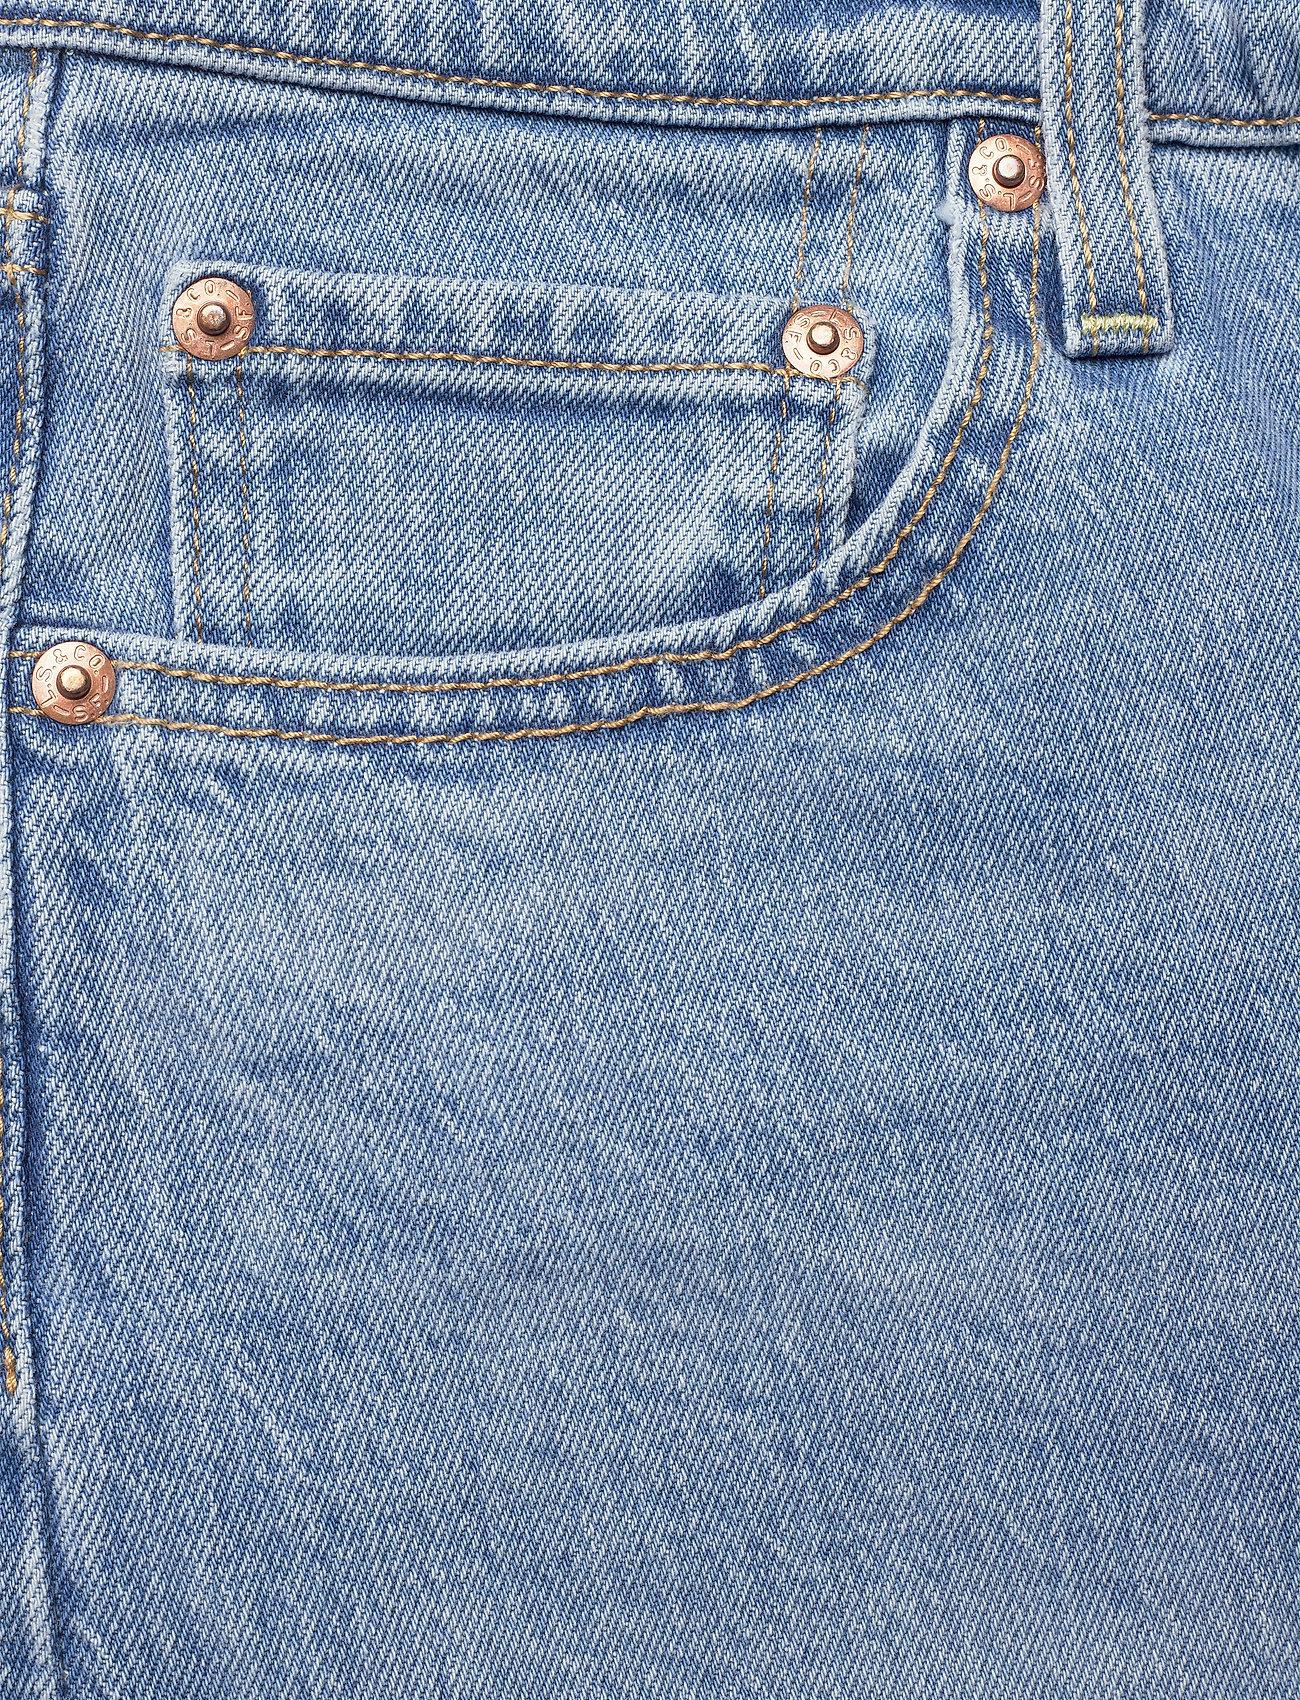 LEVI´S Women - RIBCAGE STRAIGHT ANKLE TANGO G - straight regular - light indigo - worn in - 4